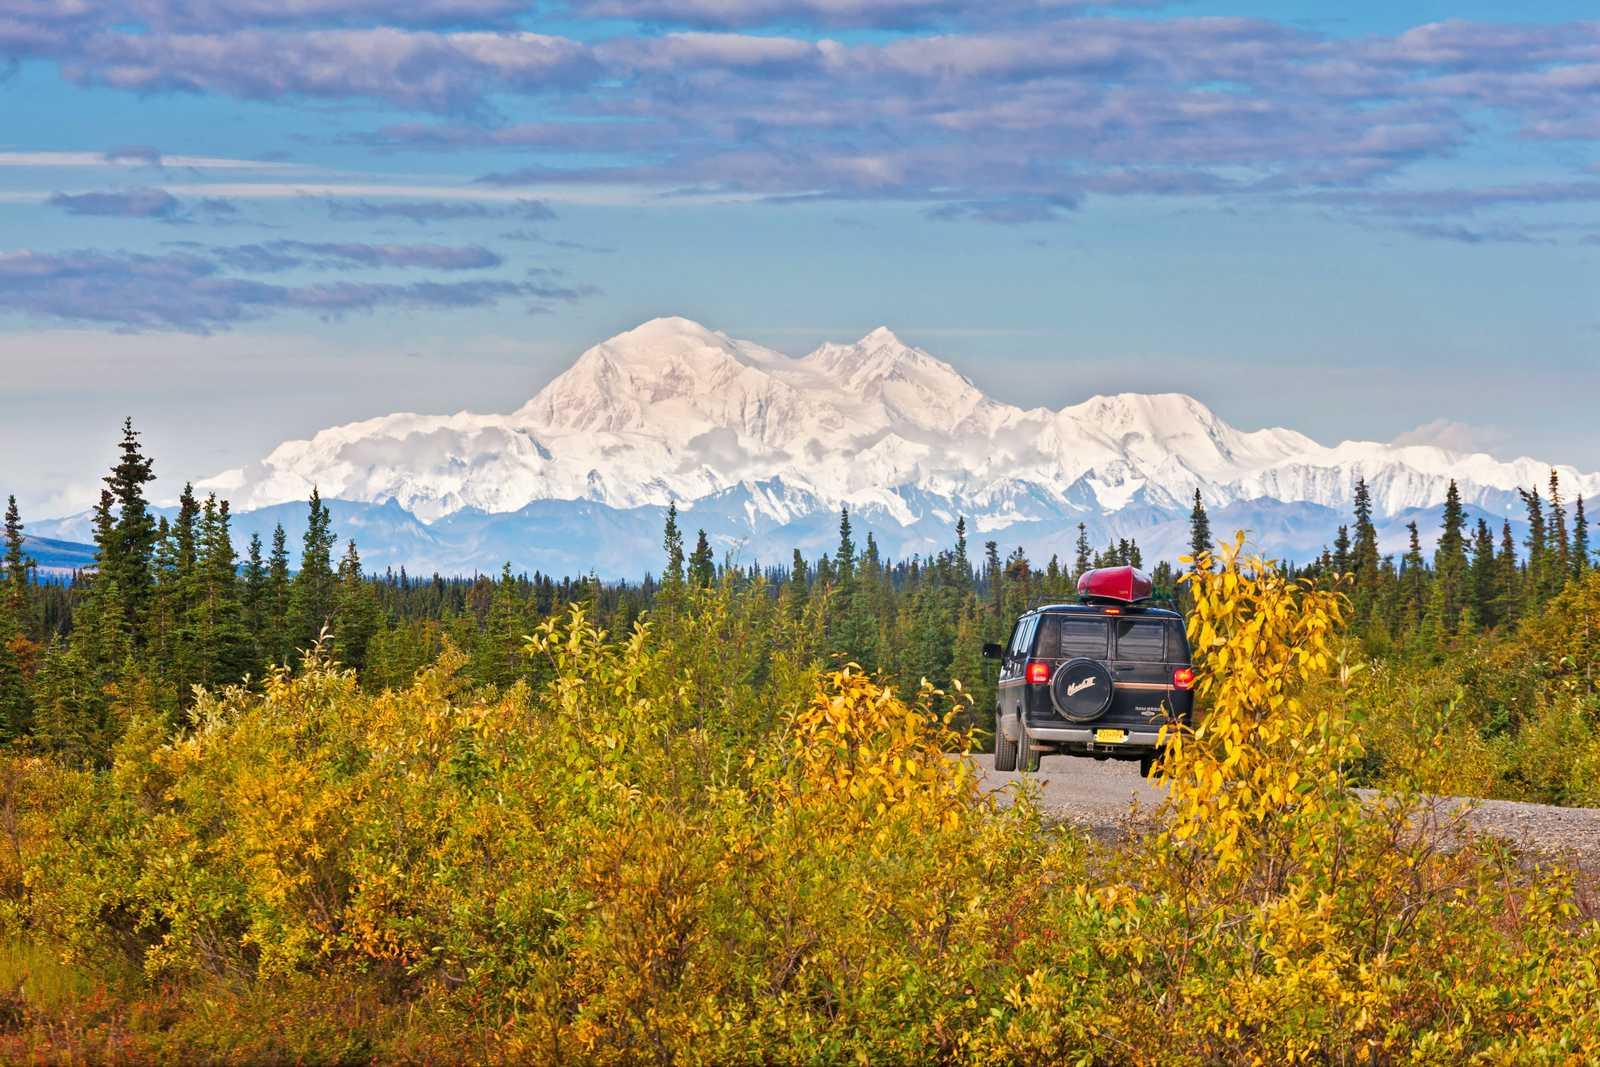 Mount McKinley, Denali Natiional Park